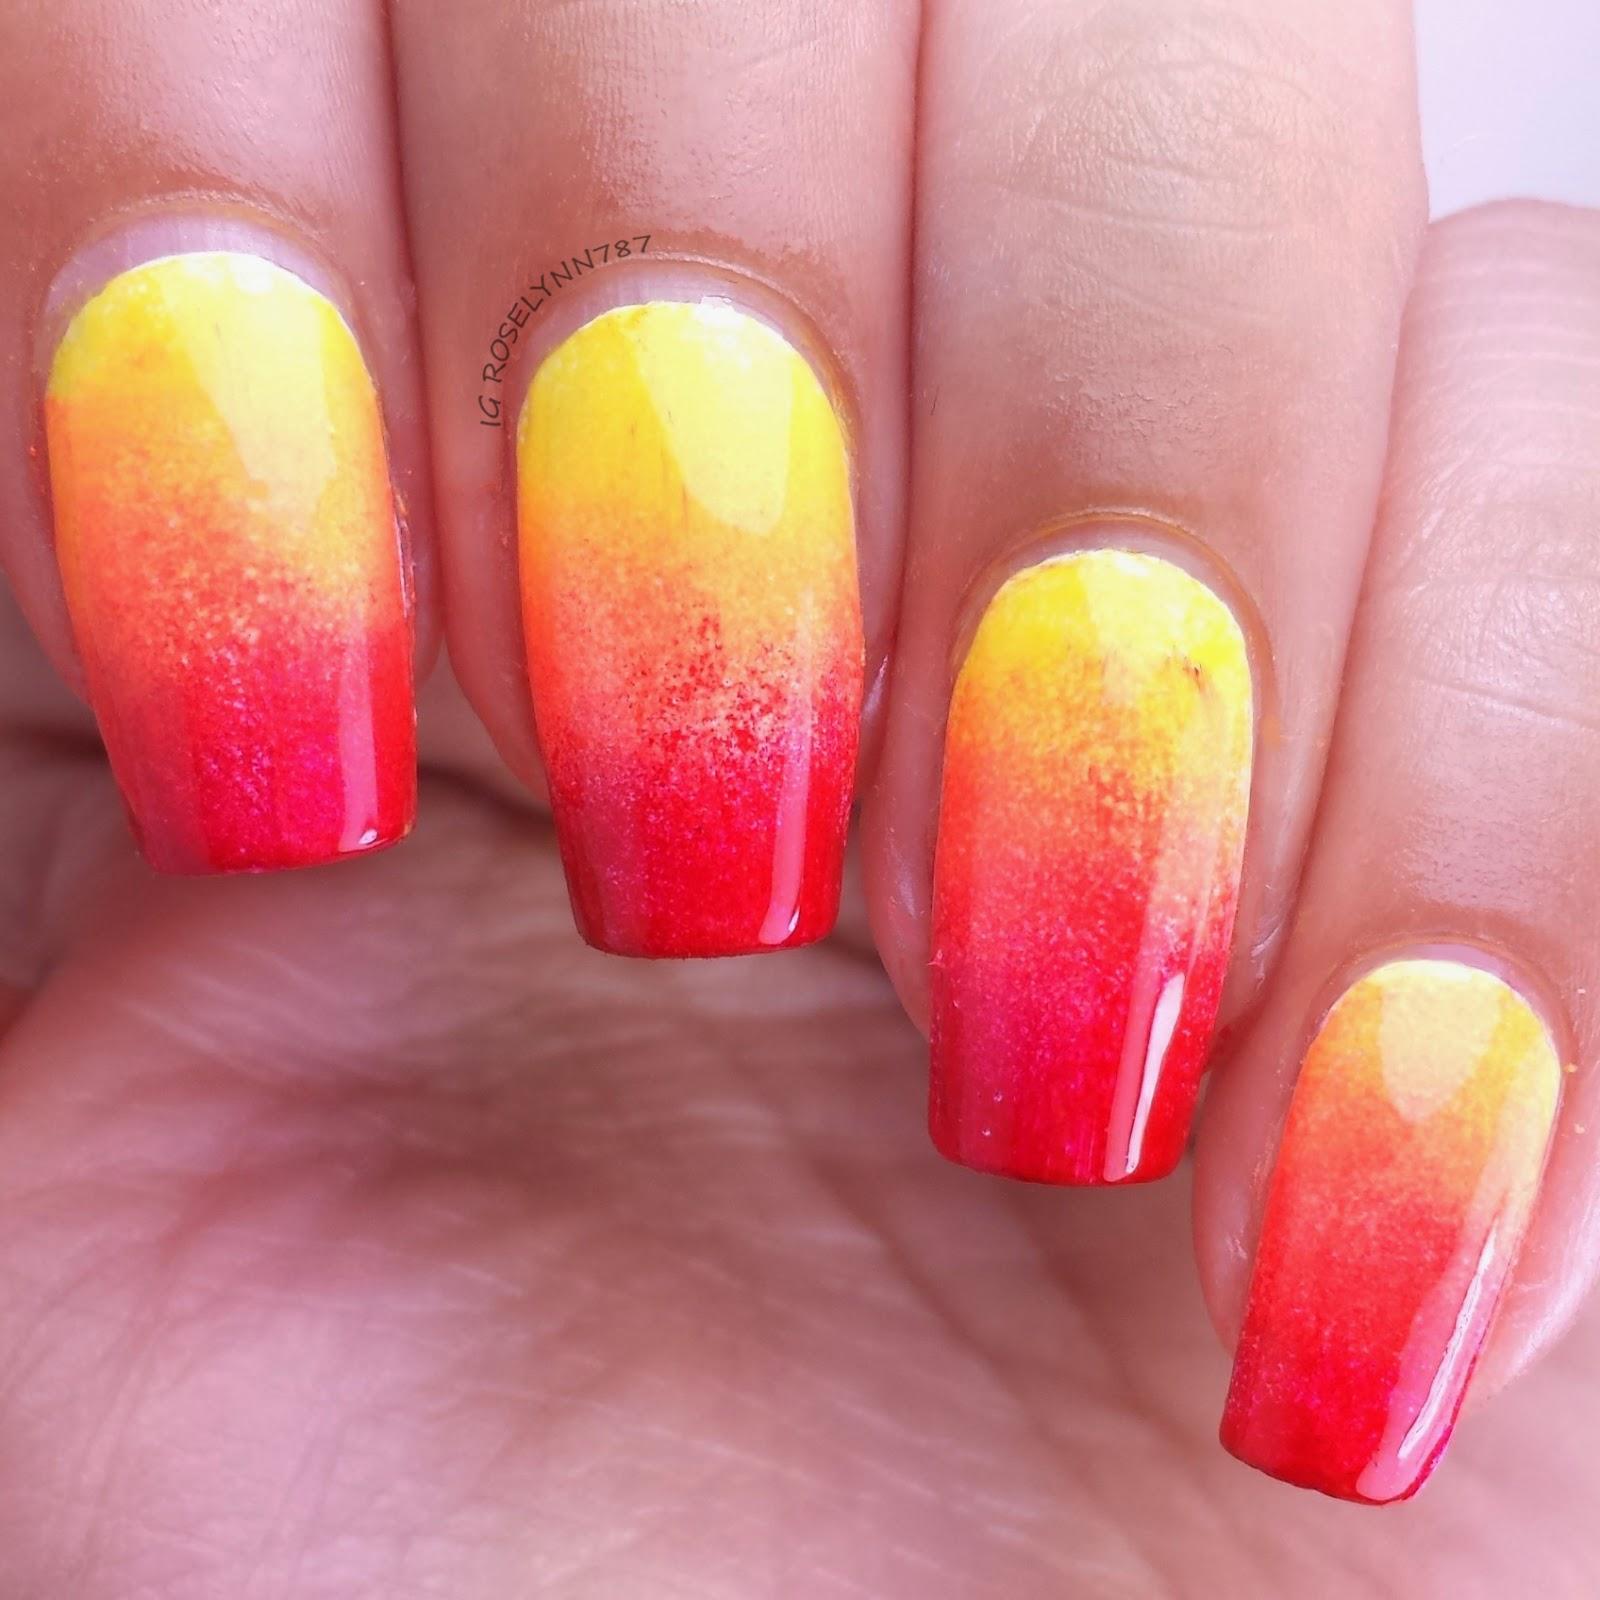 Sunsets Nails